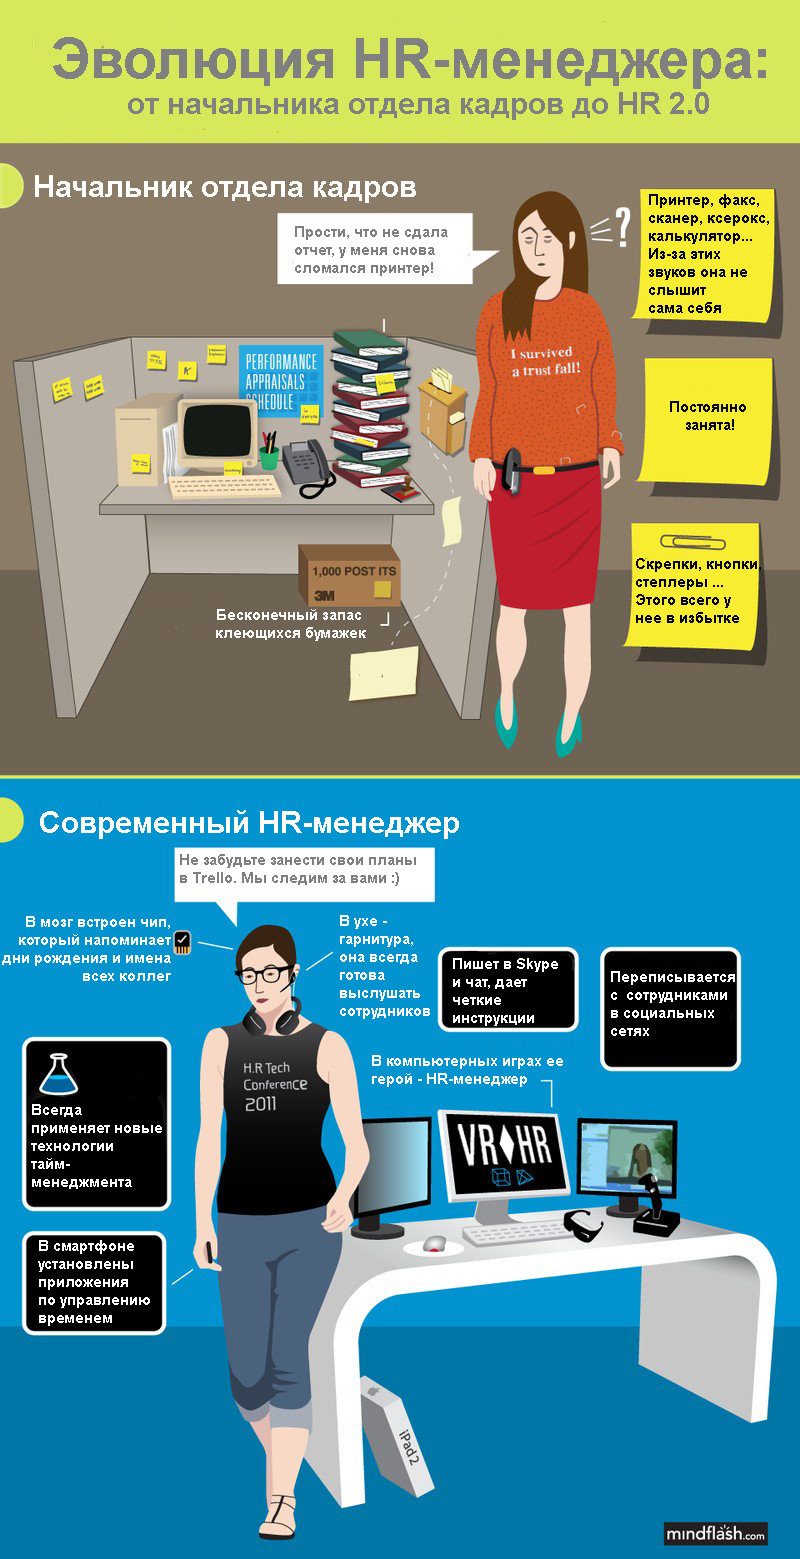 эволюция HR